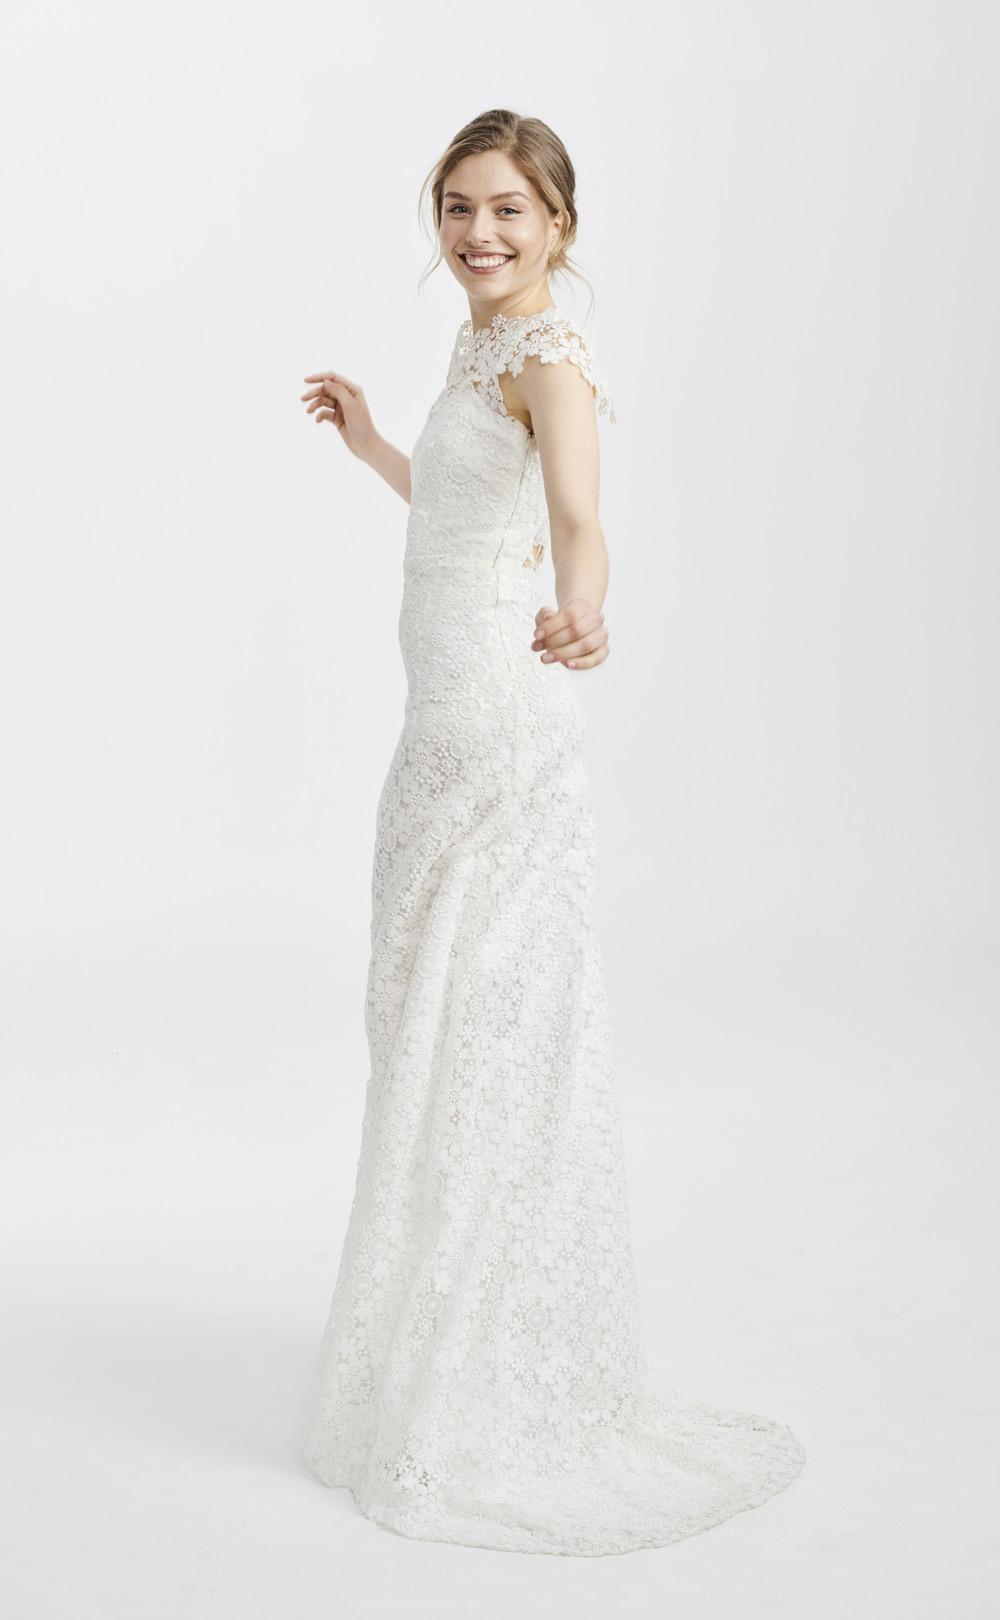 Brautkleid mit grober Spitze: Majana